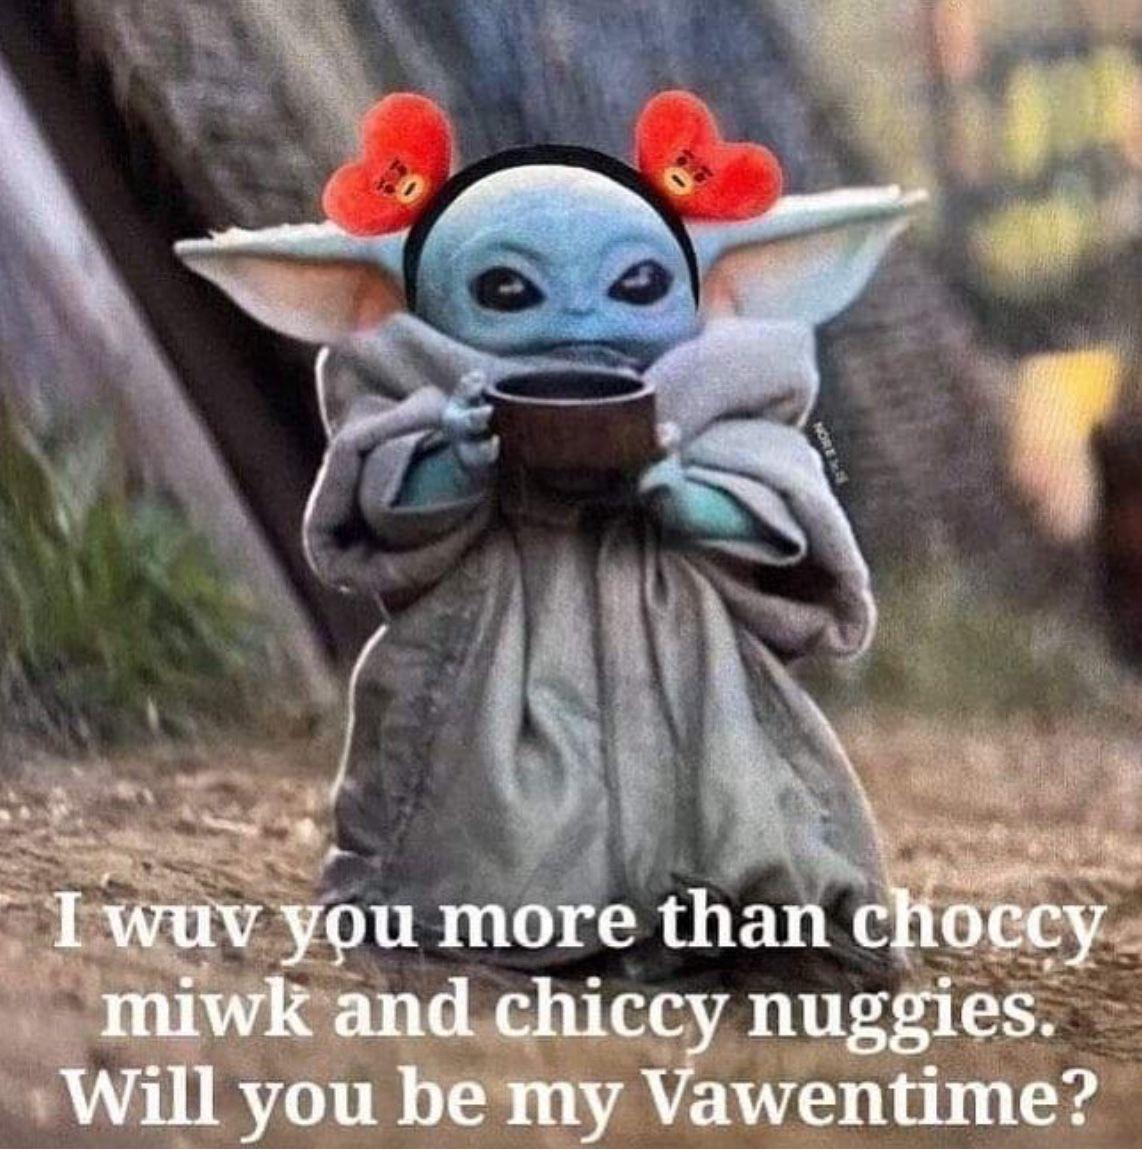 Pin By Sienna On Baby Yoda Yoda Meme Cute Memes Star Wars Humor